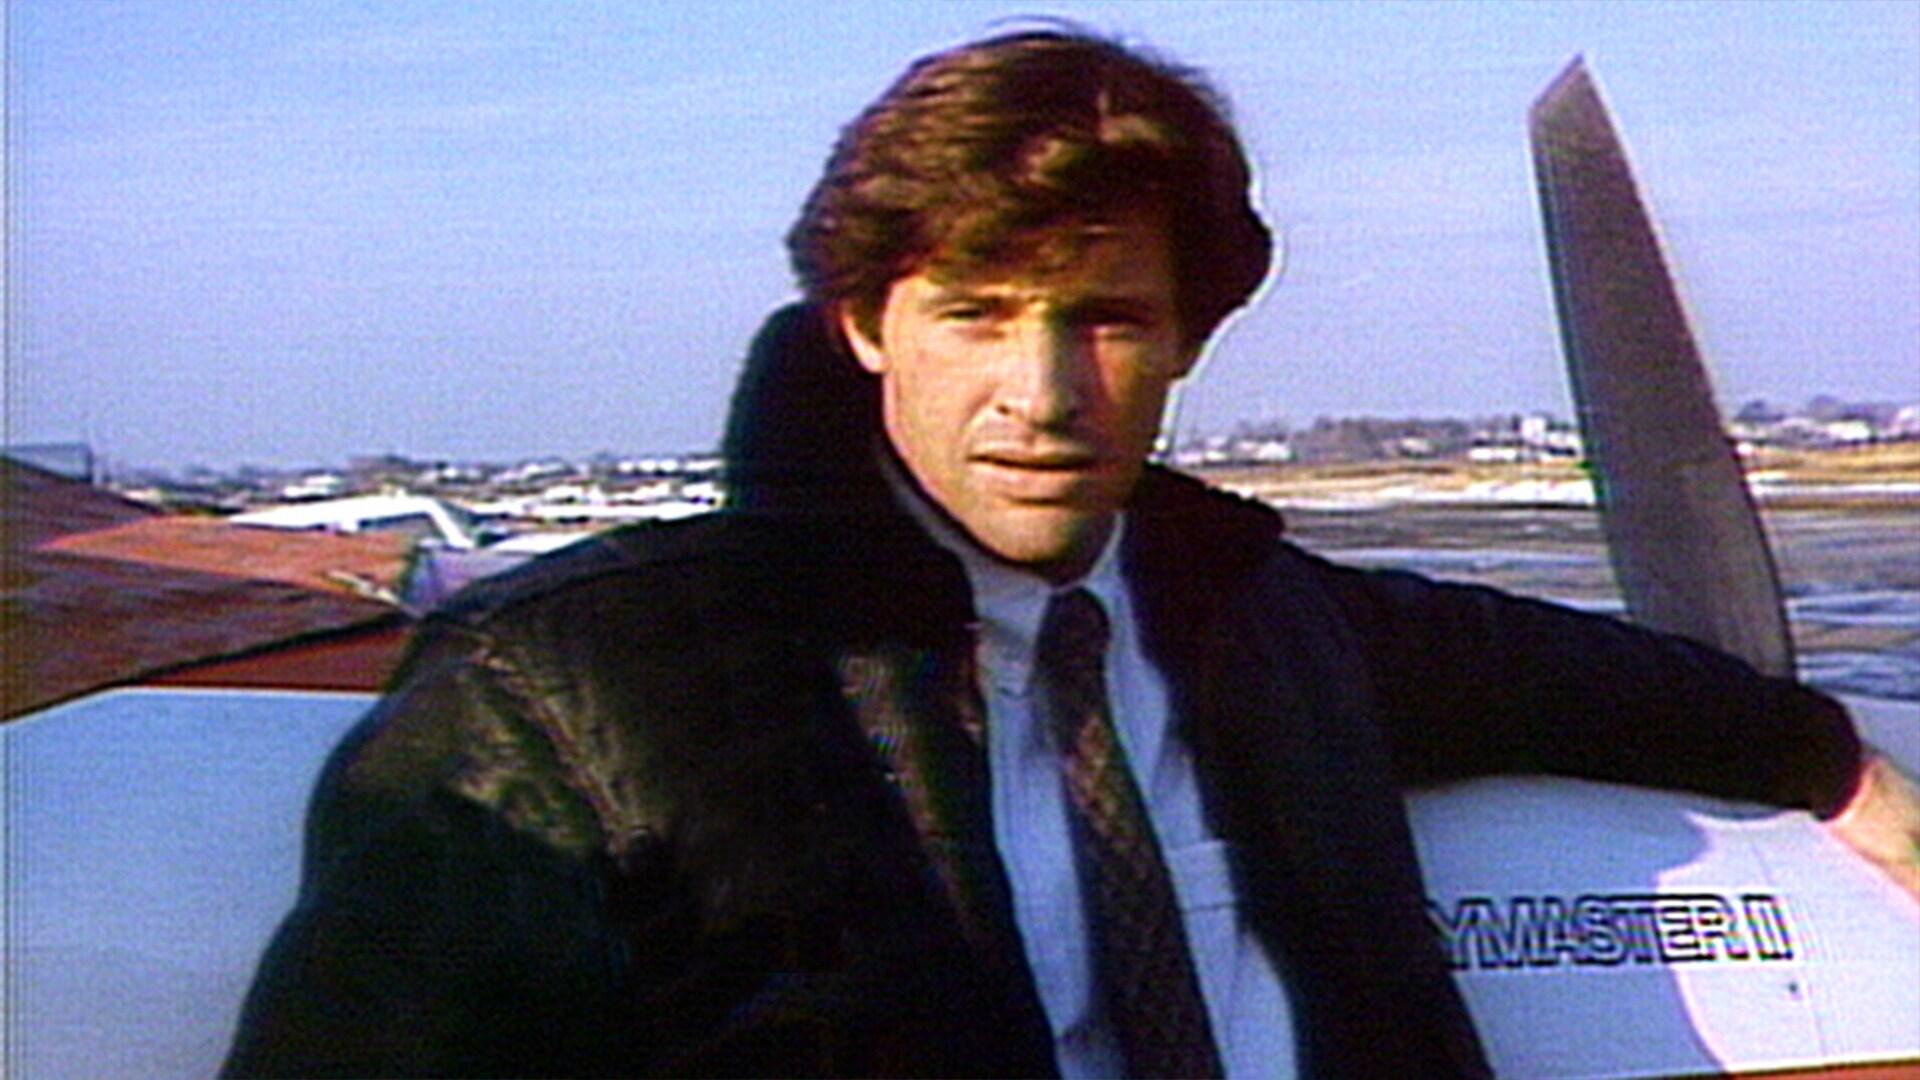 Robert Hays: January 24, 1981